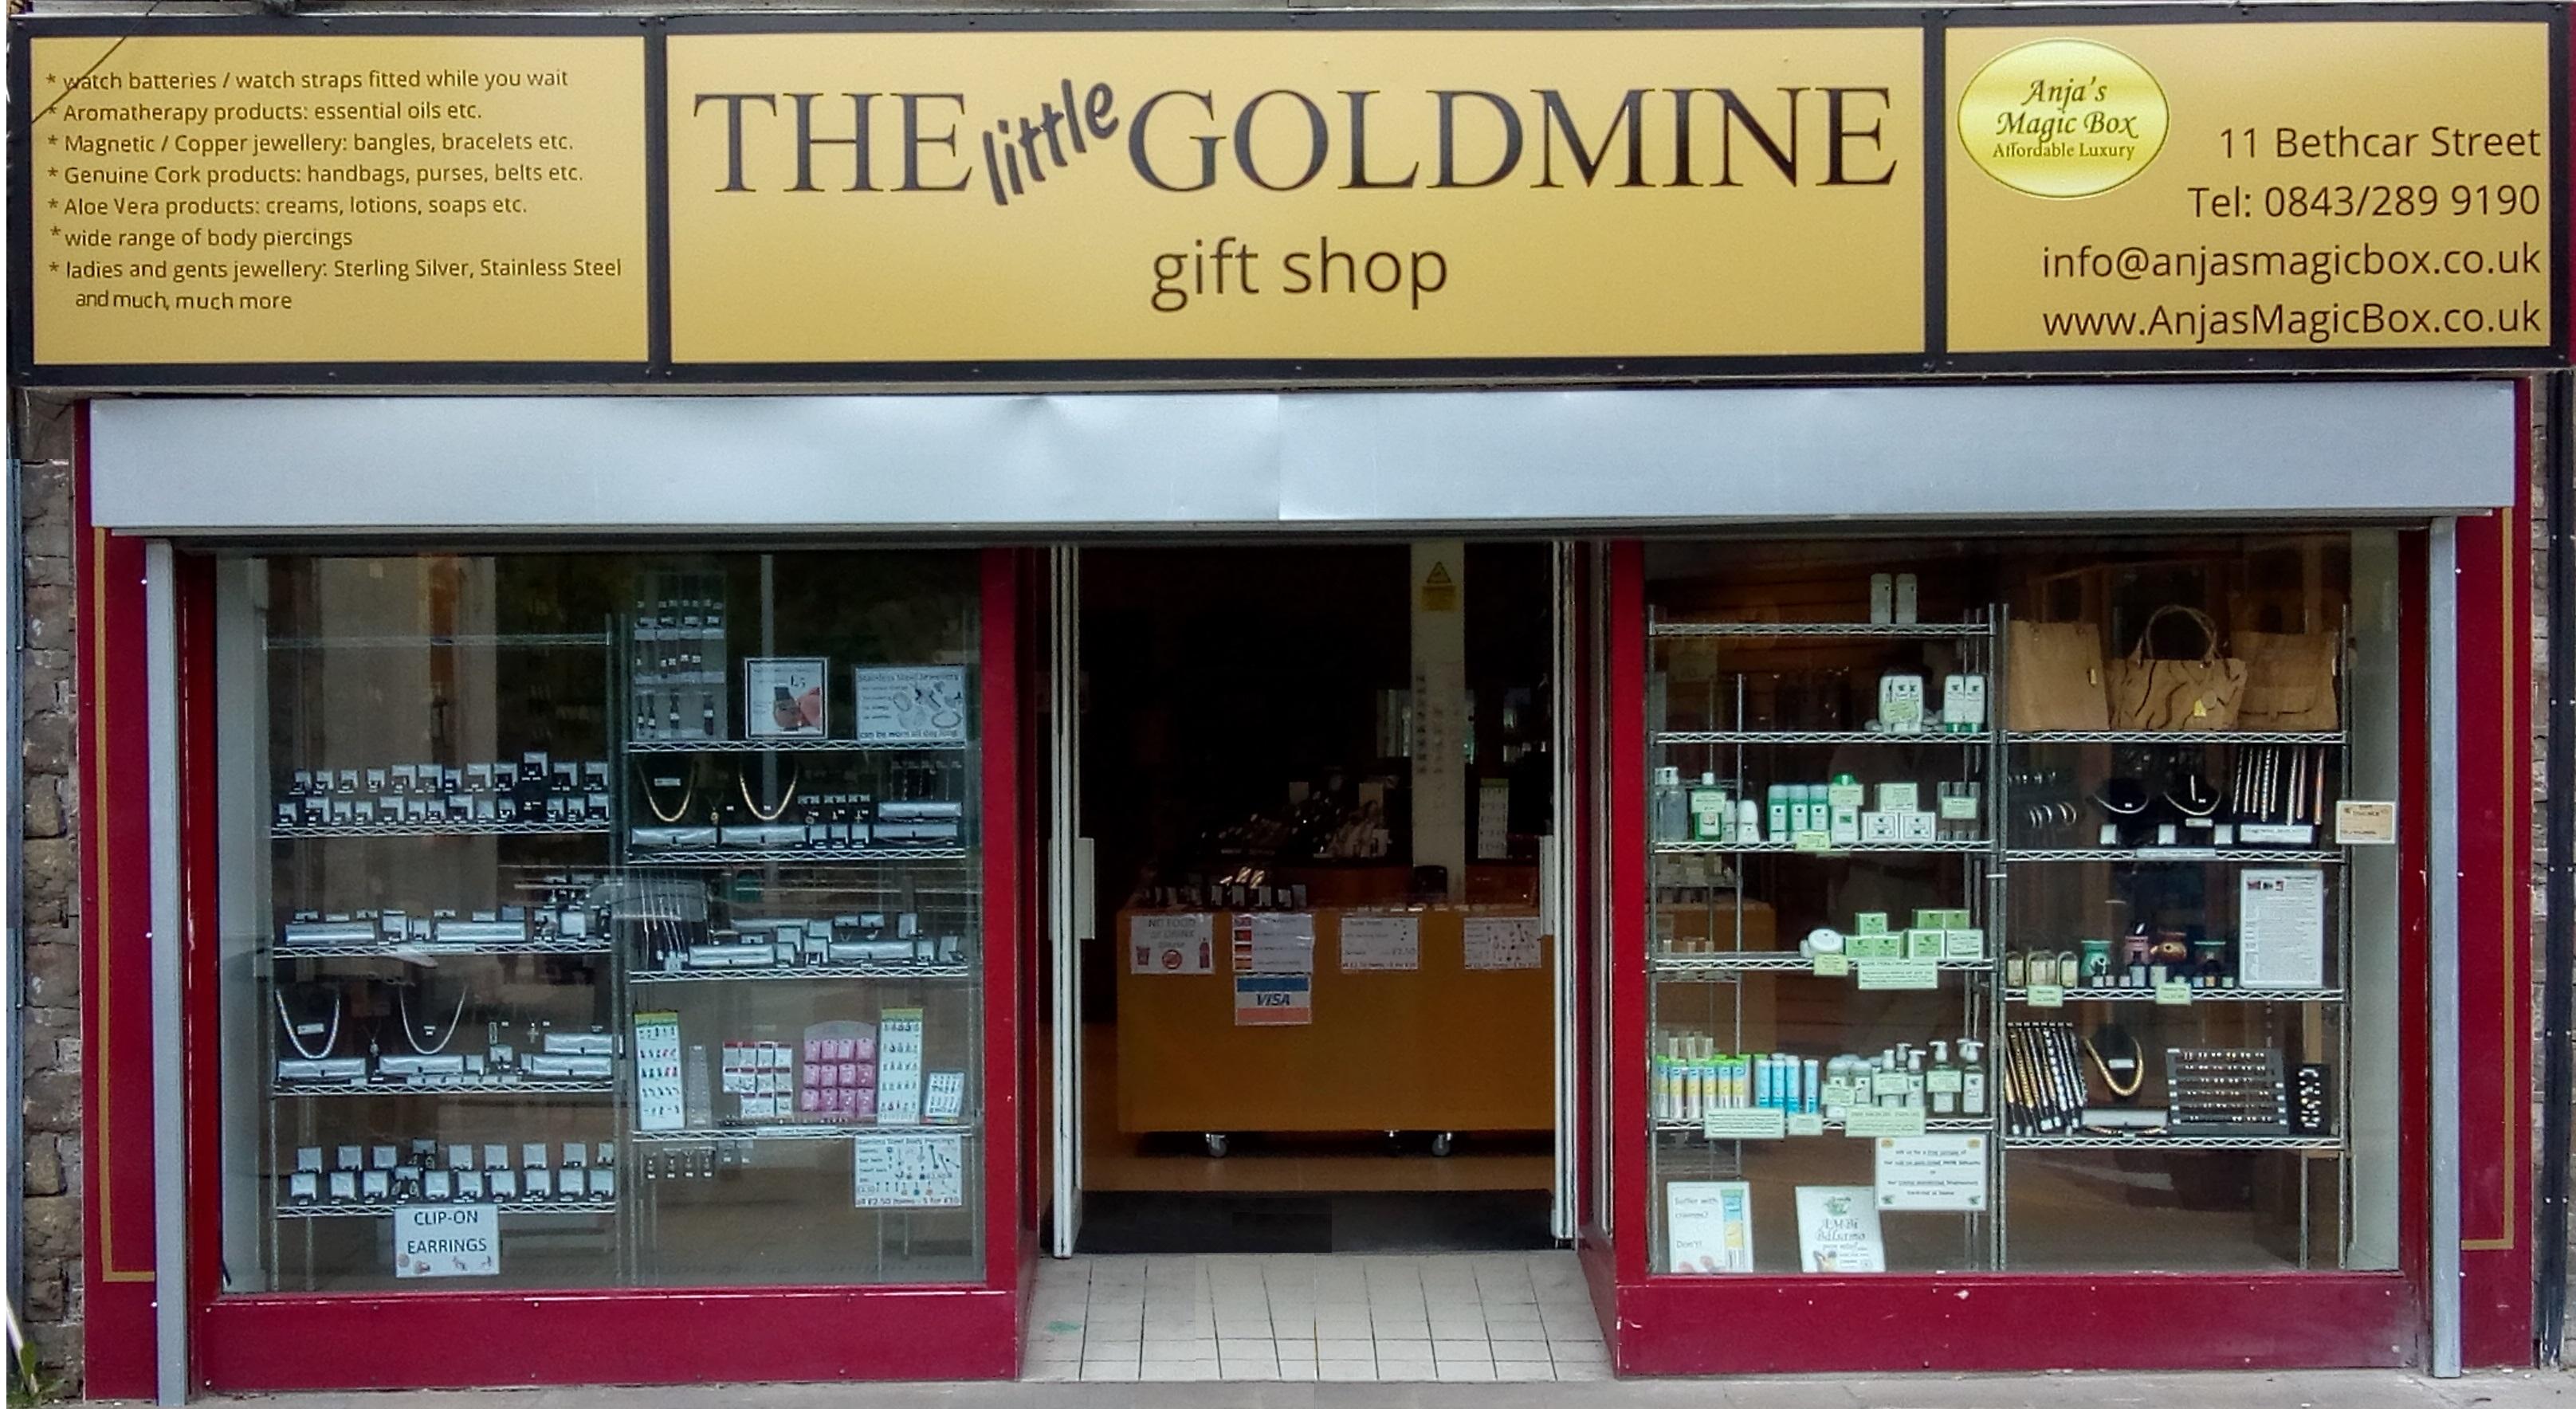 Anja's Magic box - The Goldmine